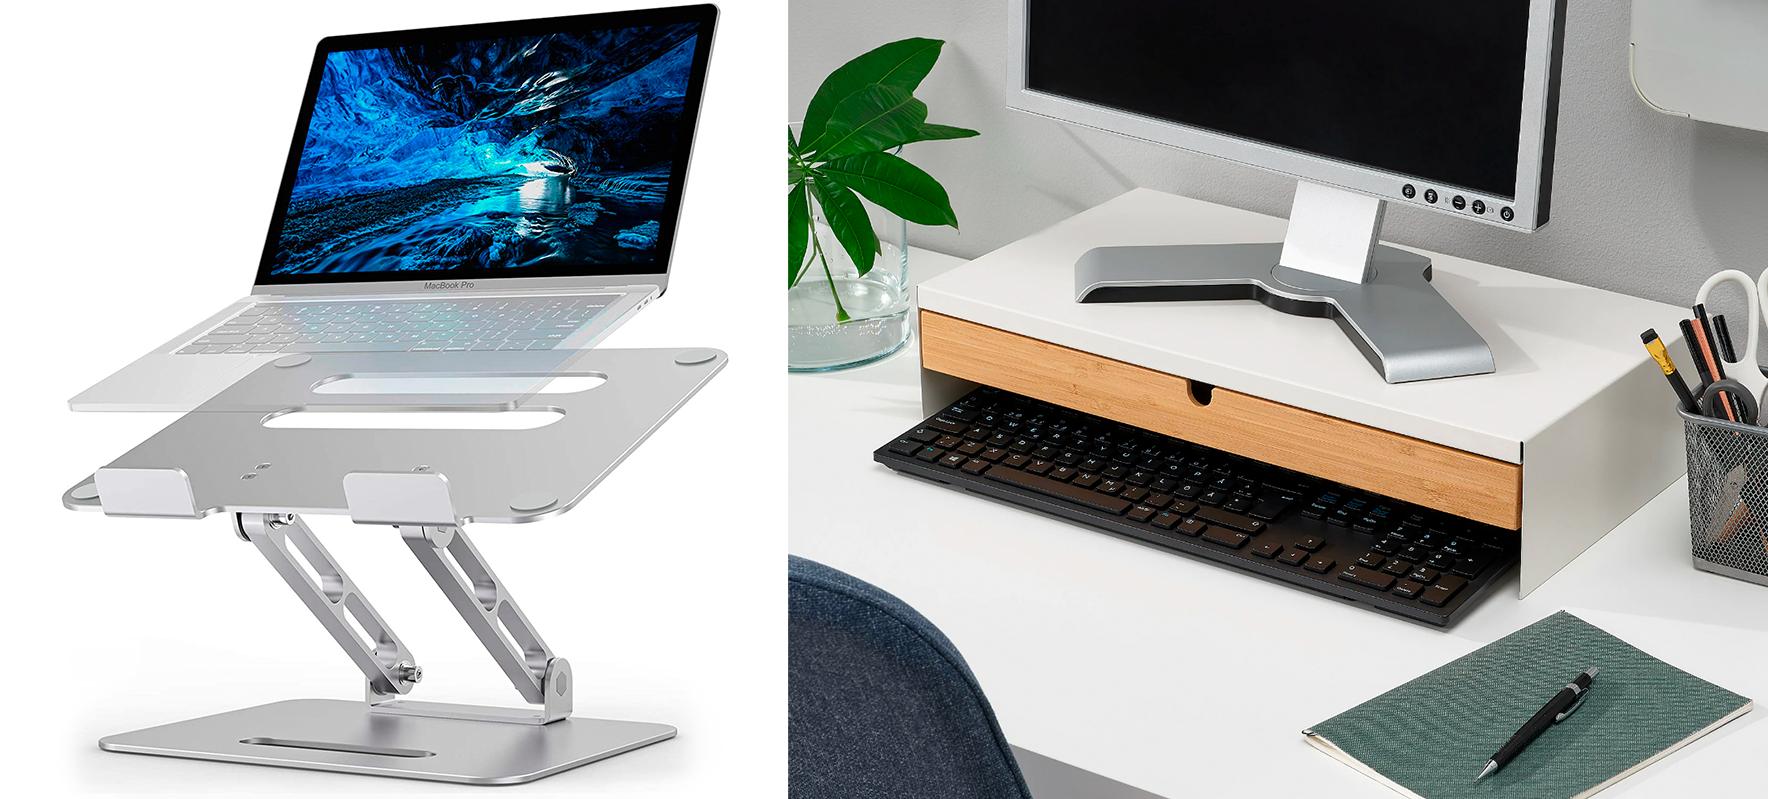 home-based business office setup